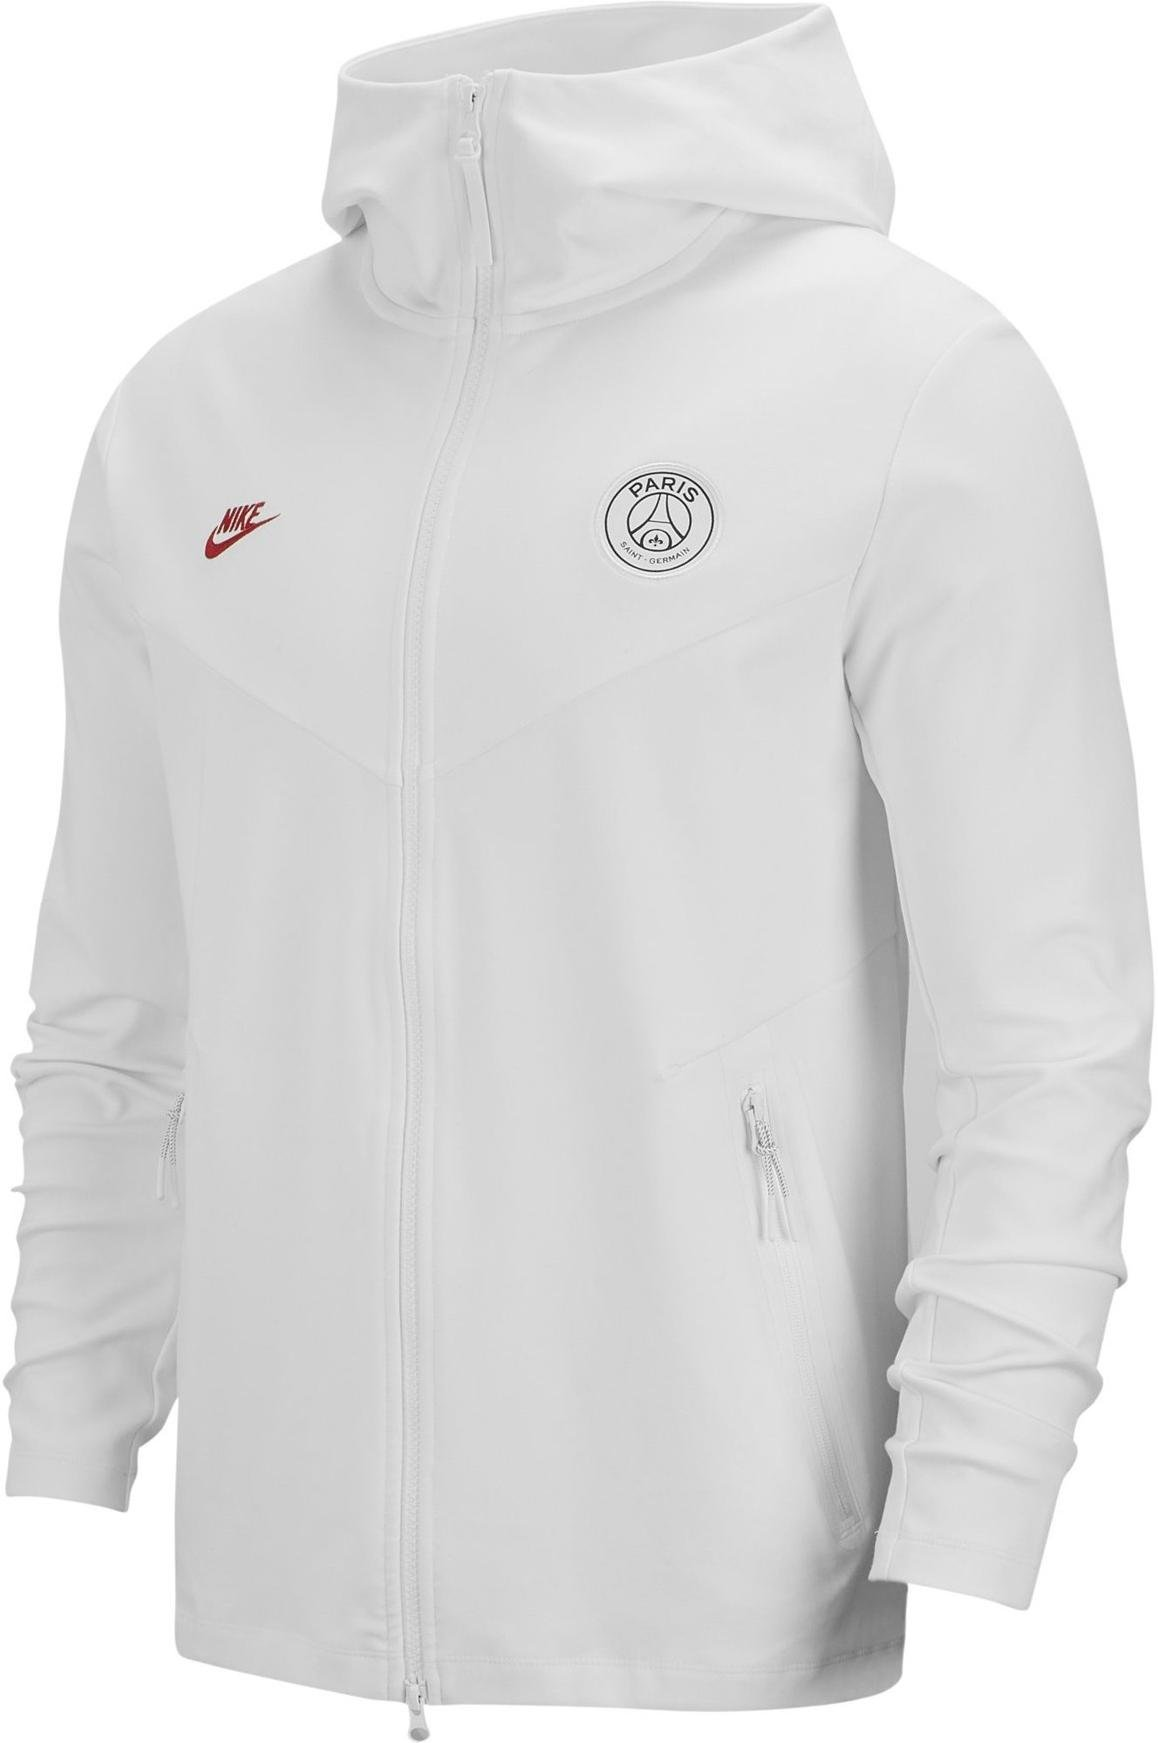 Sweatshirt à capuche Nike PSG M NSW TCH PCK HOODIE FZ CL